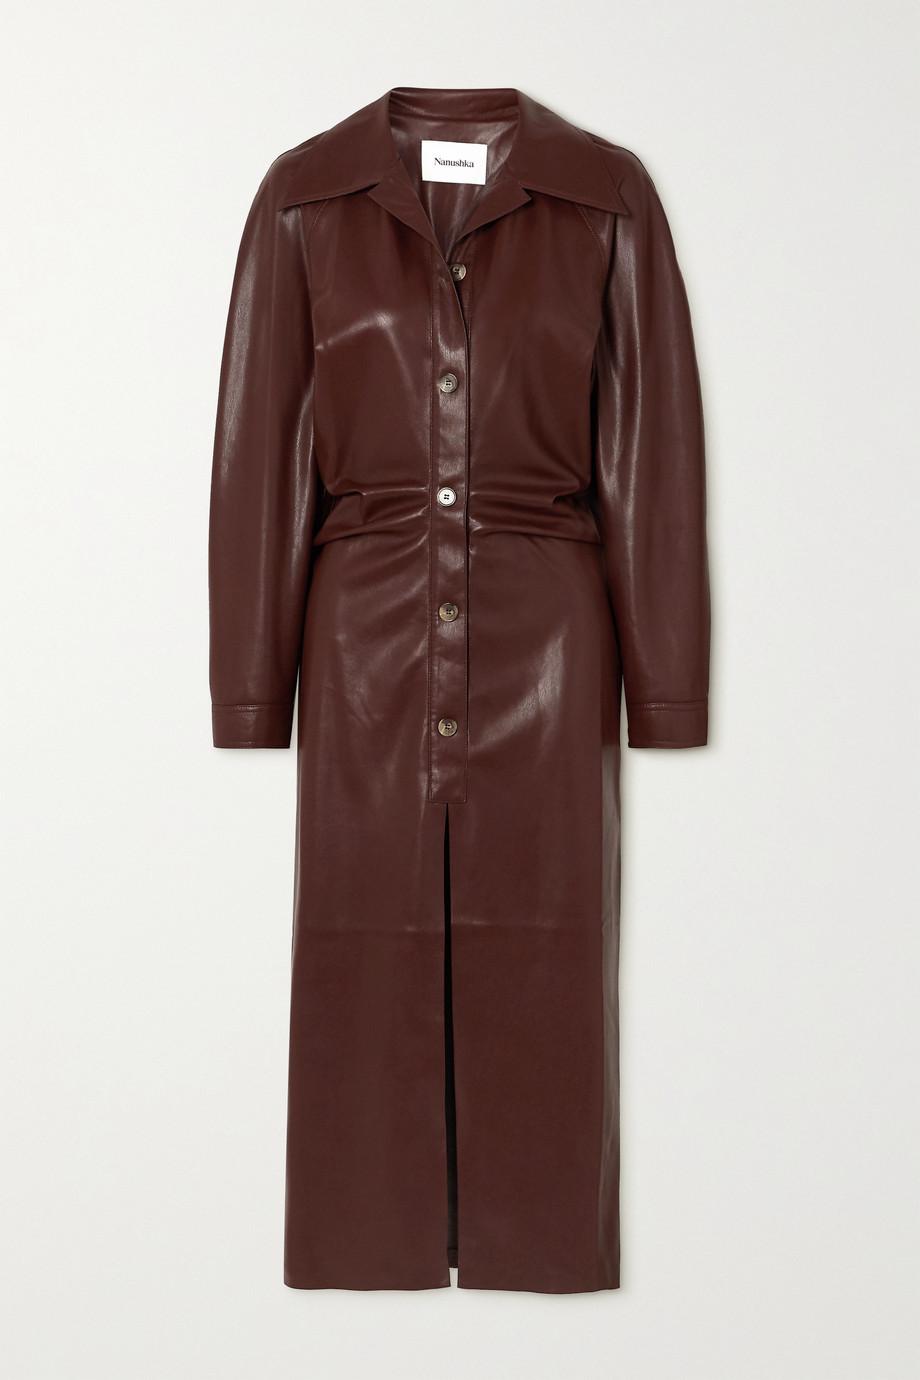 Nanushka Sami 褶饰纯素弹力皮革衬衫式连衣裙